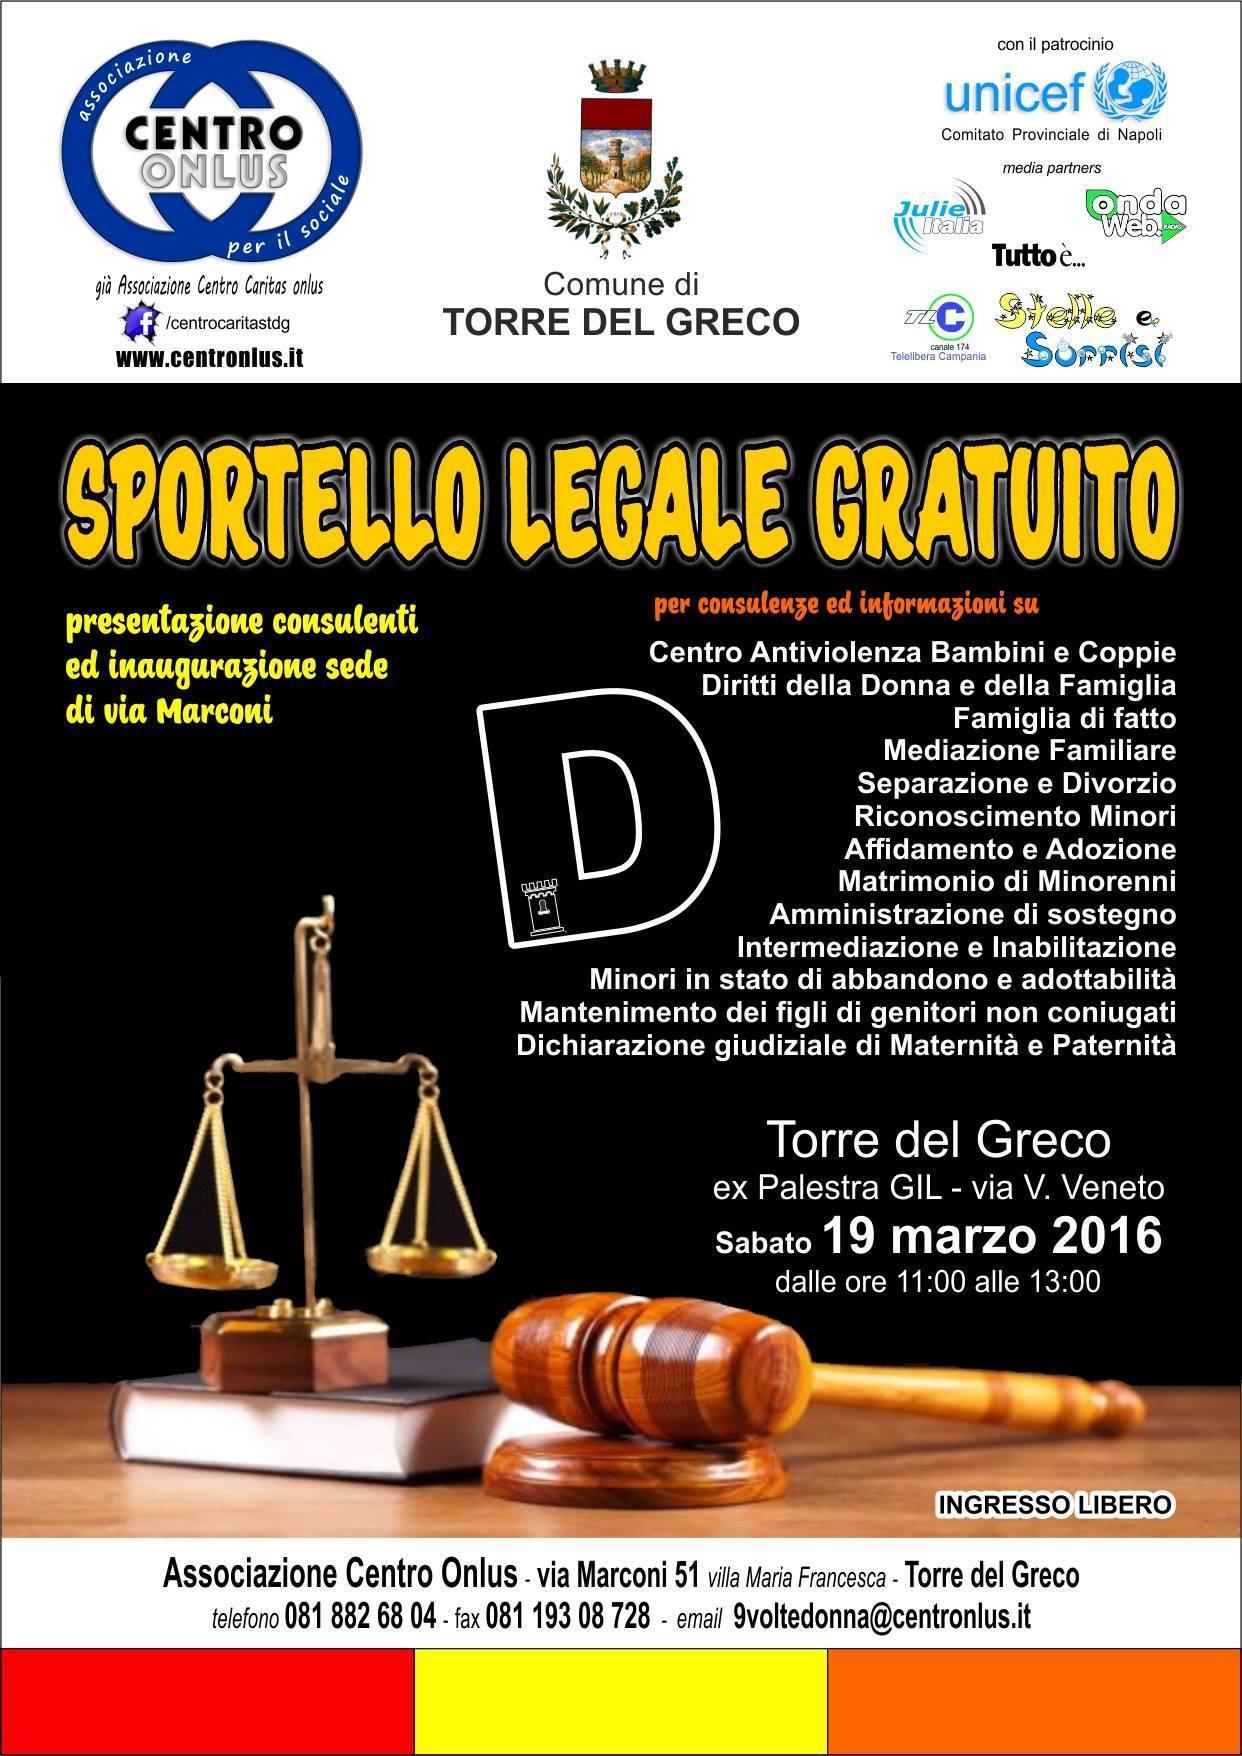 Torre del Greco 19 marzo 2016